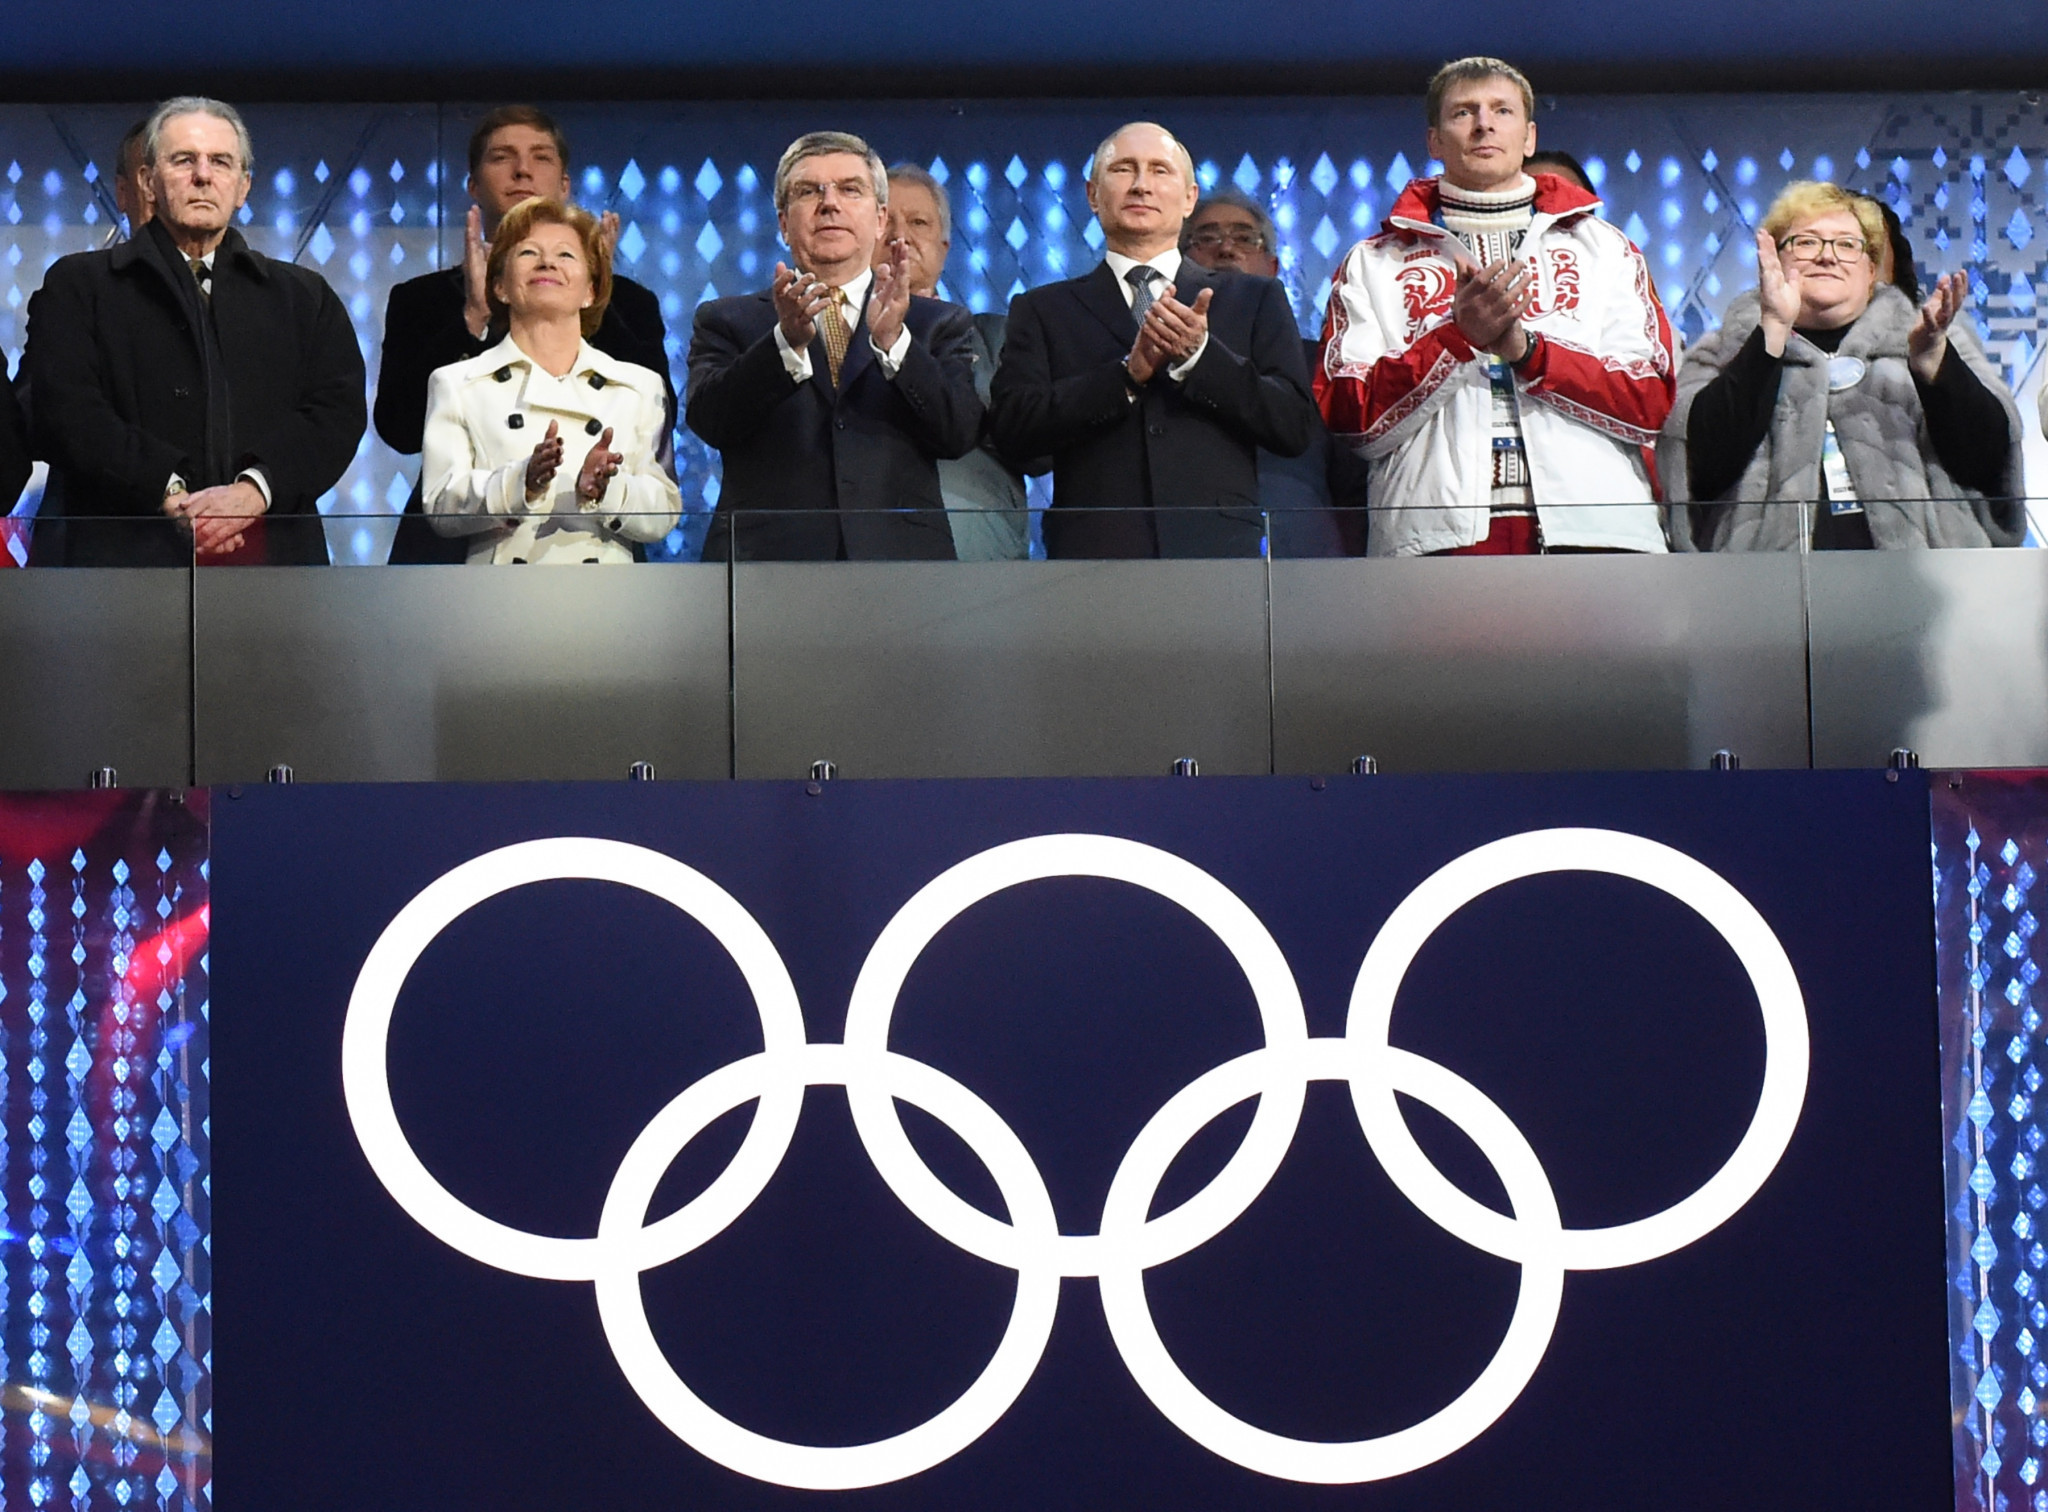 Alexander Zubkov, second right, alongside Russian President Vladimir Putin at the Closing Ceremony of Sochi 2014 ©Getty Images